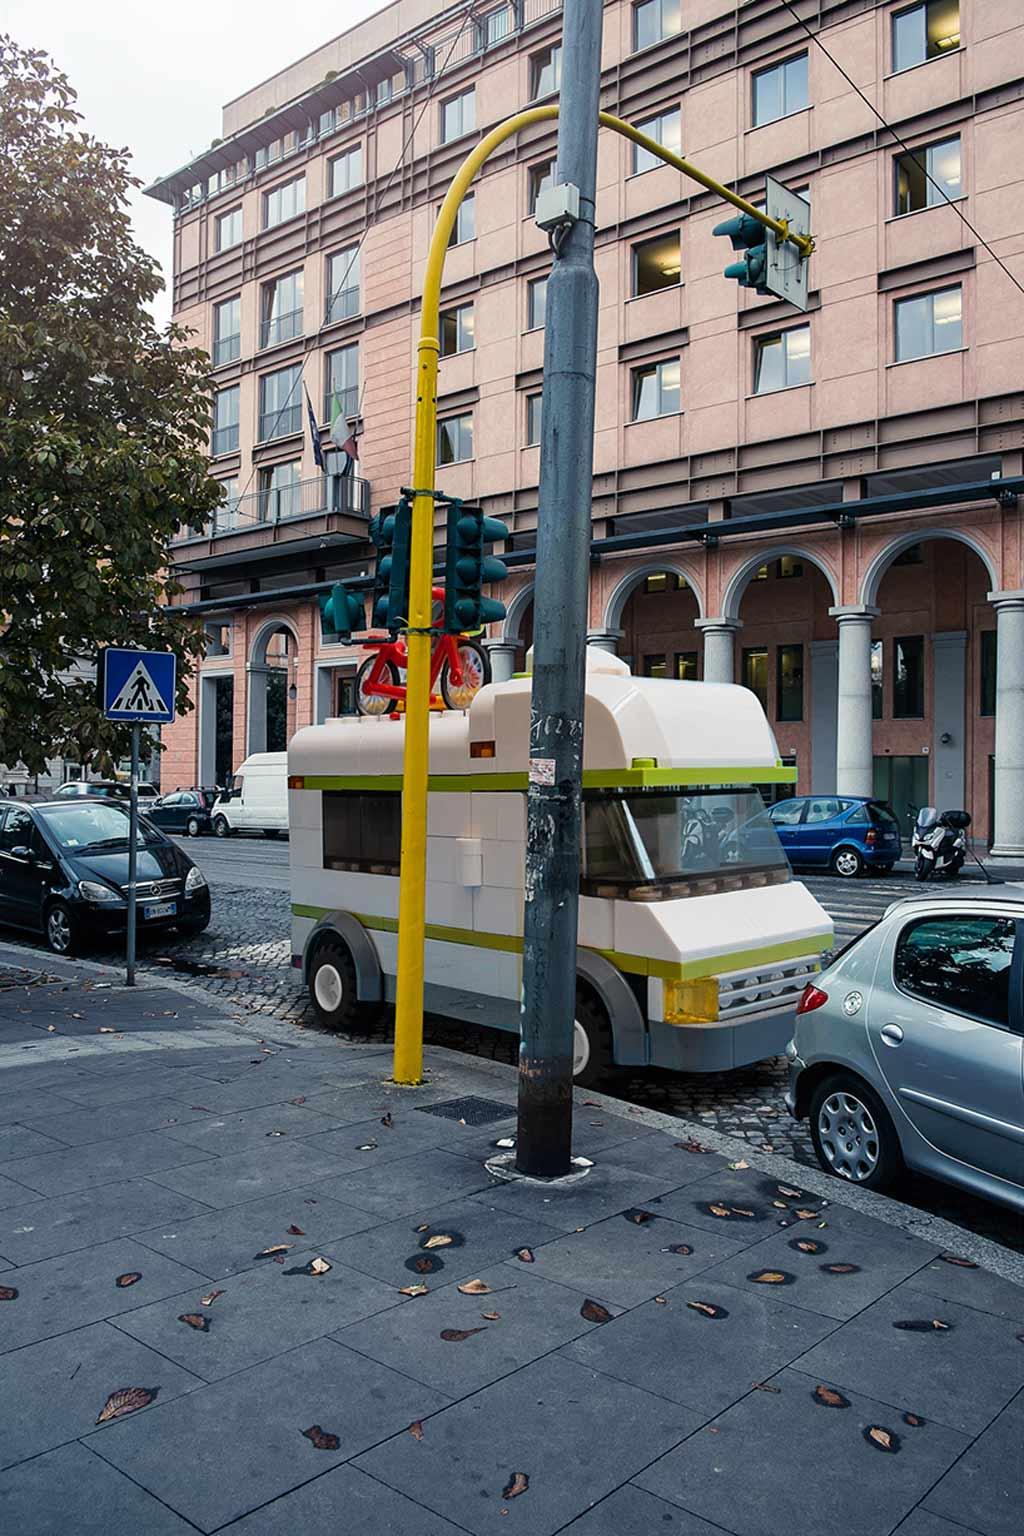 Da parkt ja ein... LEGO Wohnmobil! | © Domenico Franco